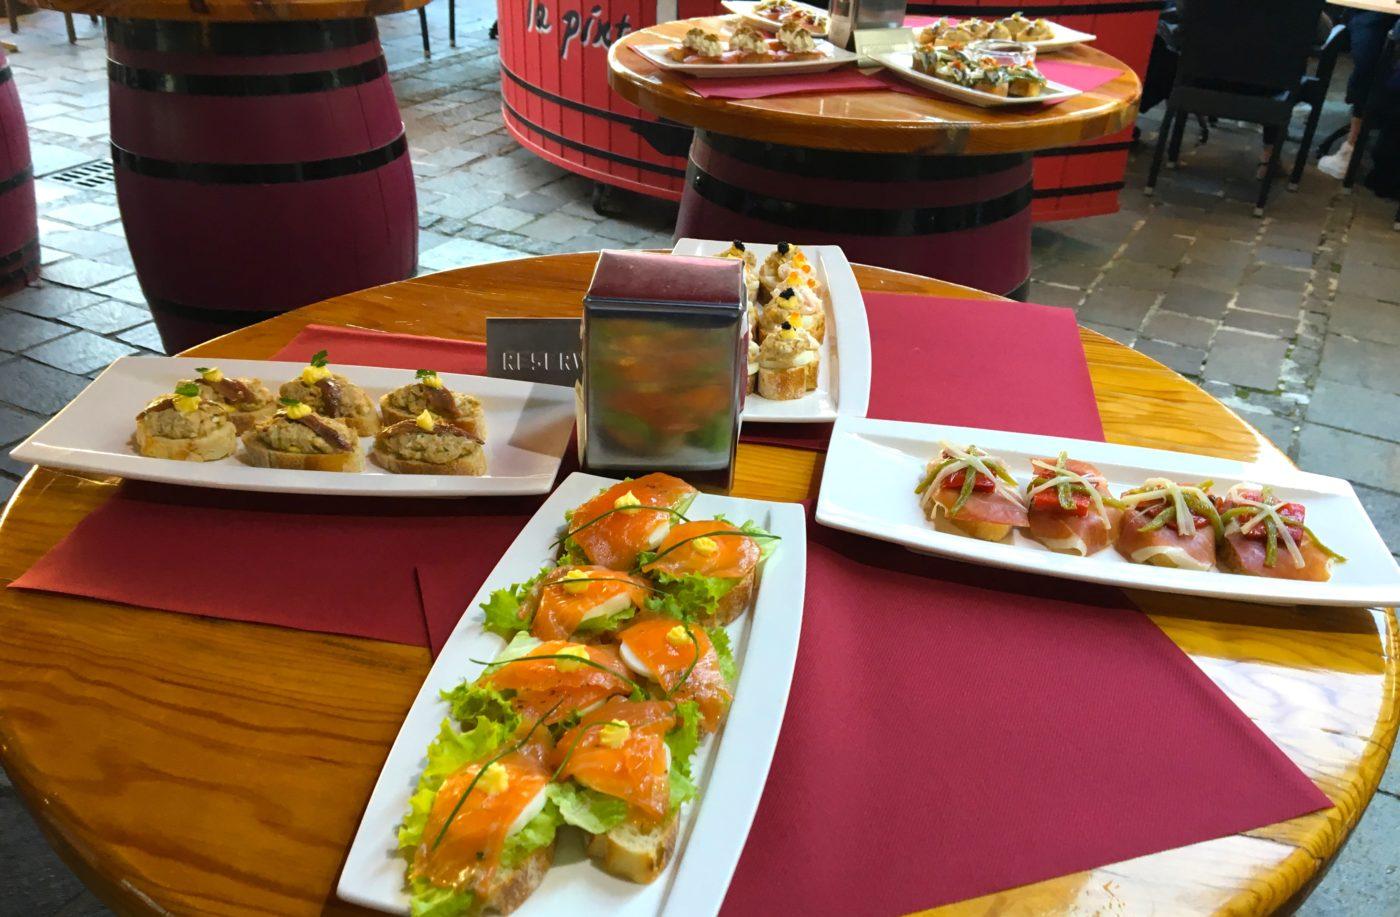 Seminaire pays basque saint jean de luz croisiere degustation vin egiategia grand hotel loreamar agence-evenementielle receptive voyage pays basque erronda